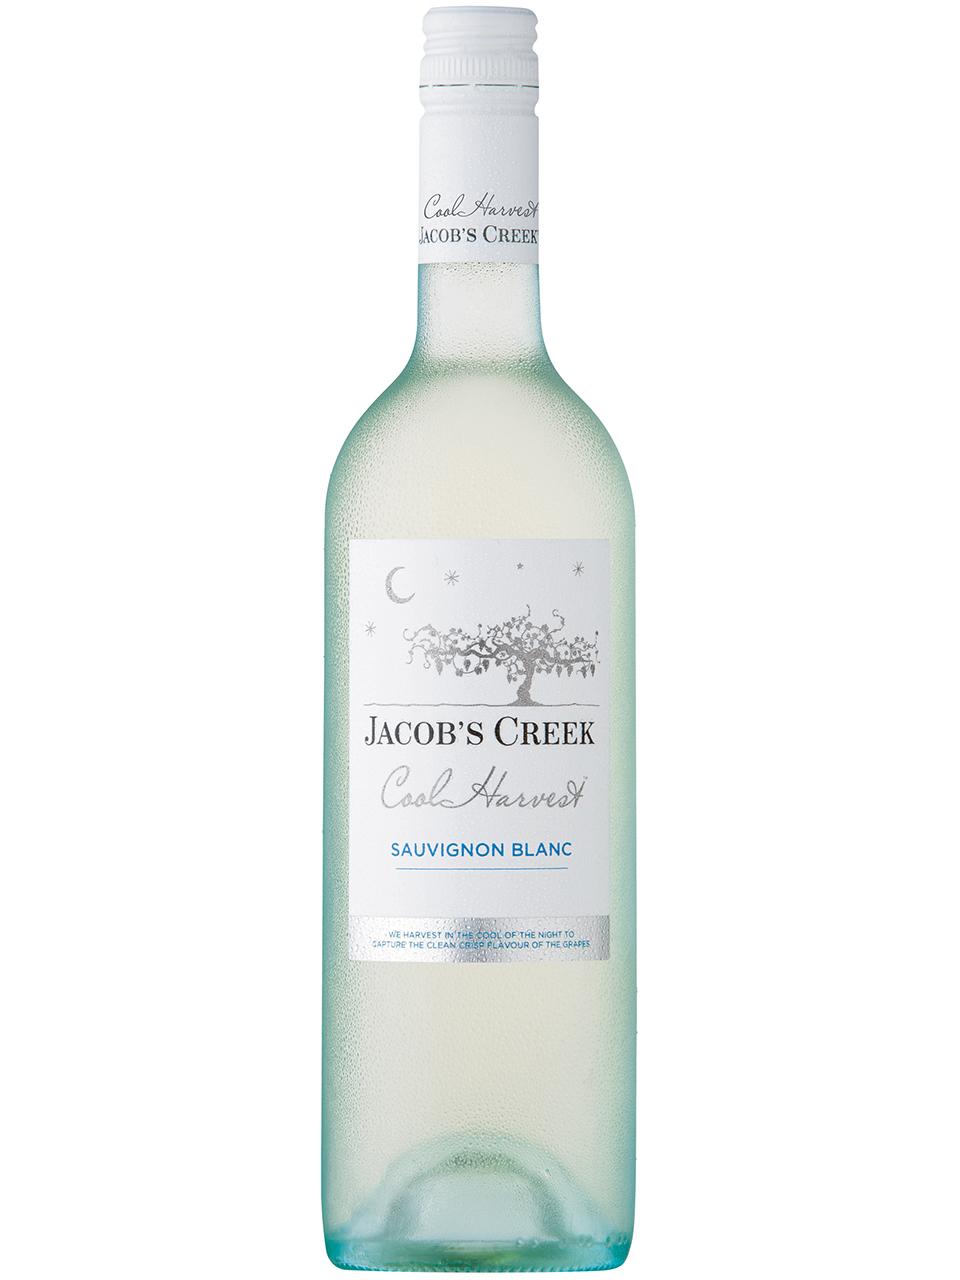 Jacob's Creek Cool Harvest Sauvignon Blanc